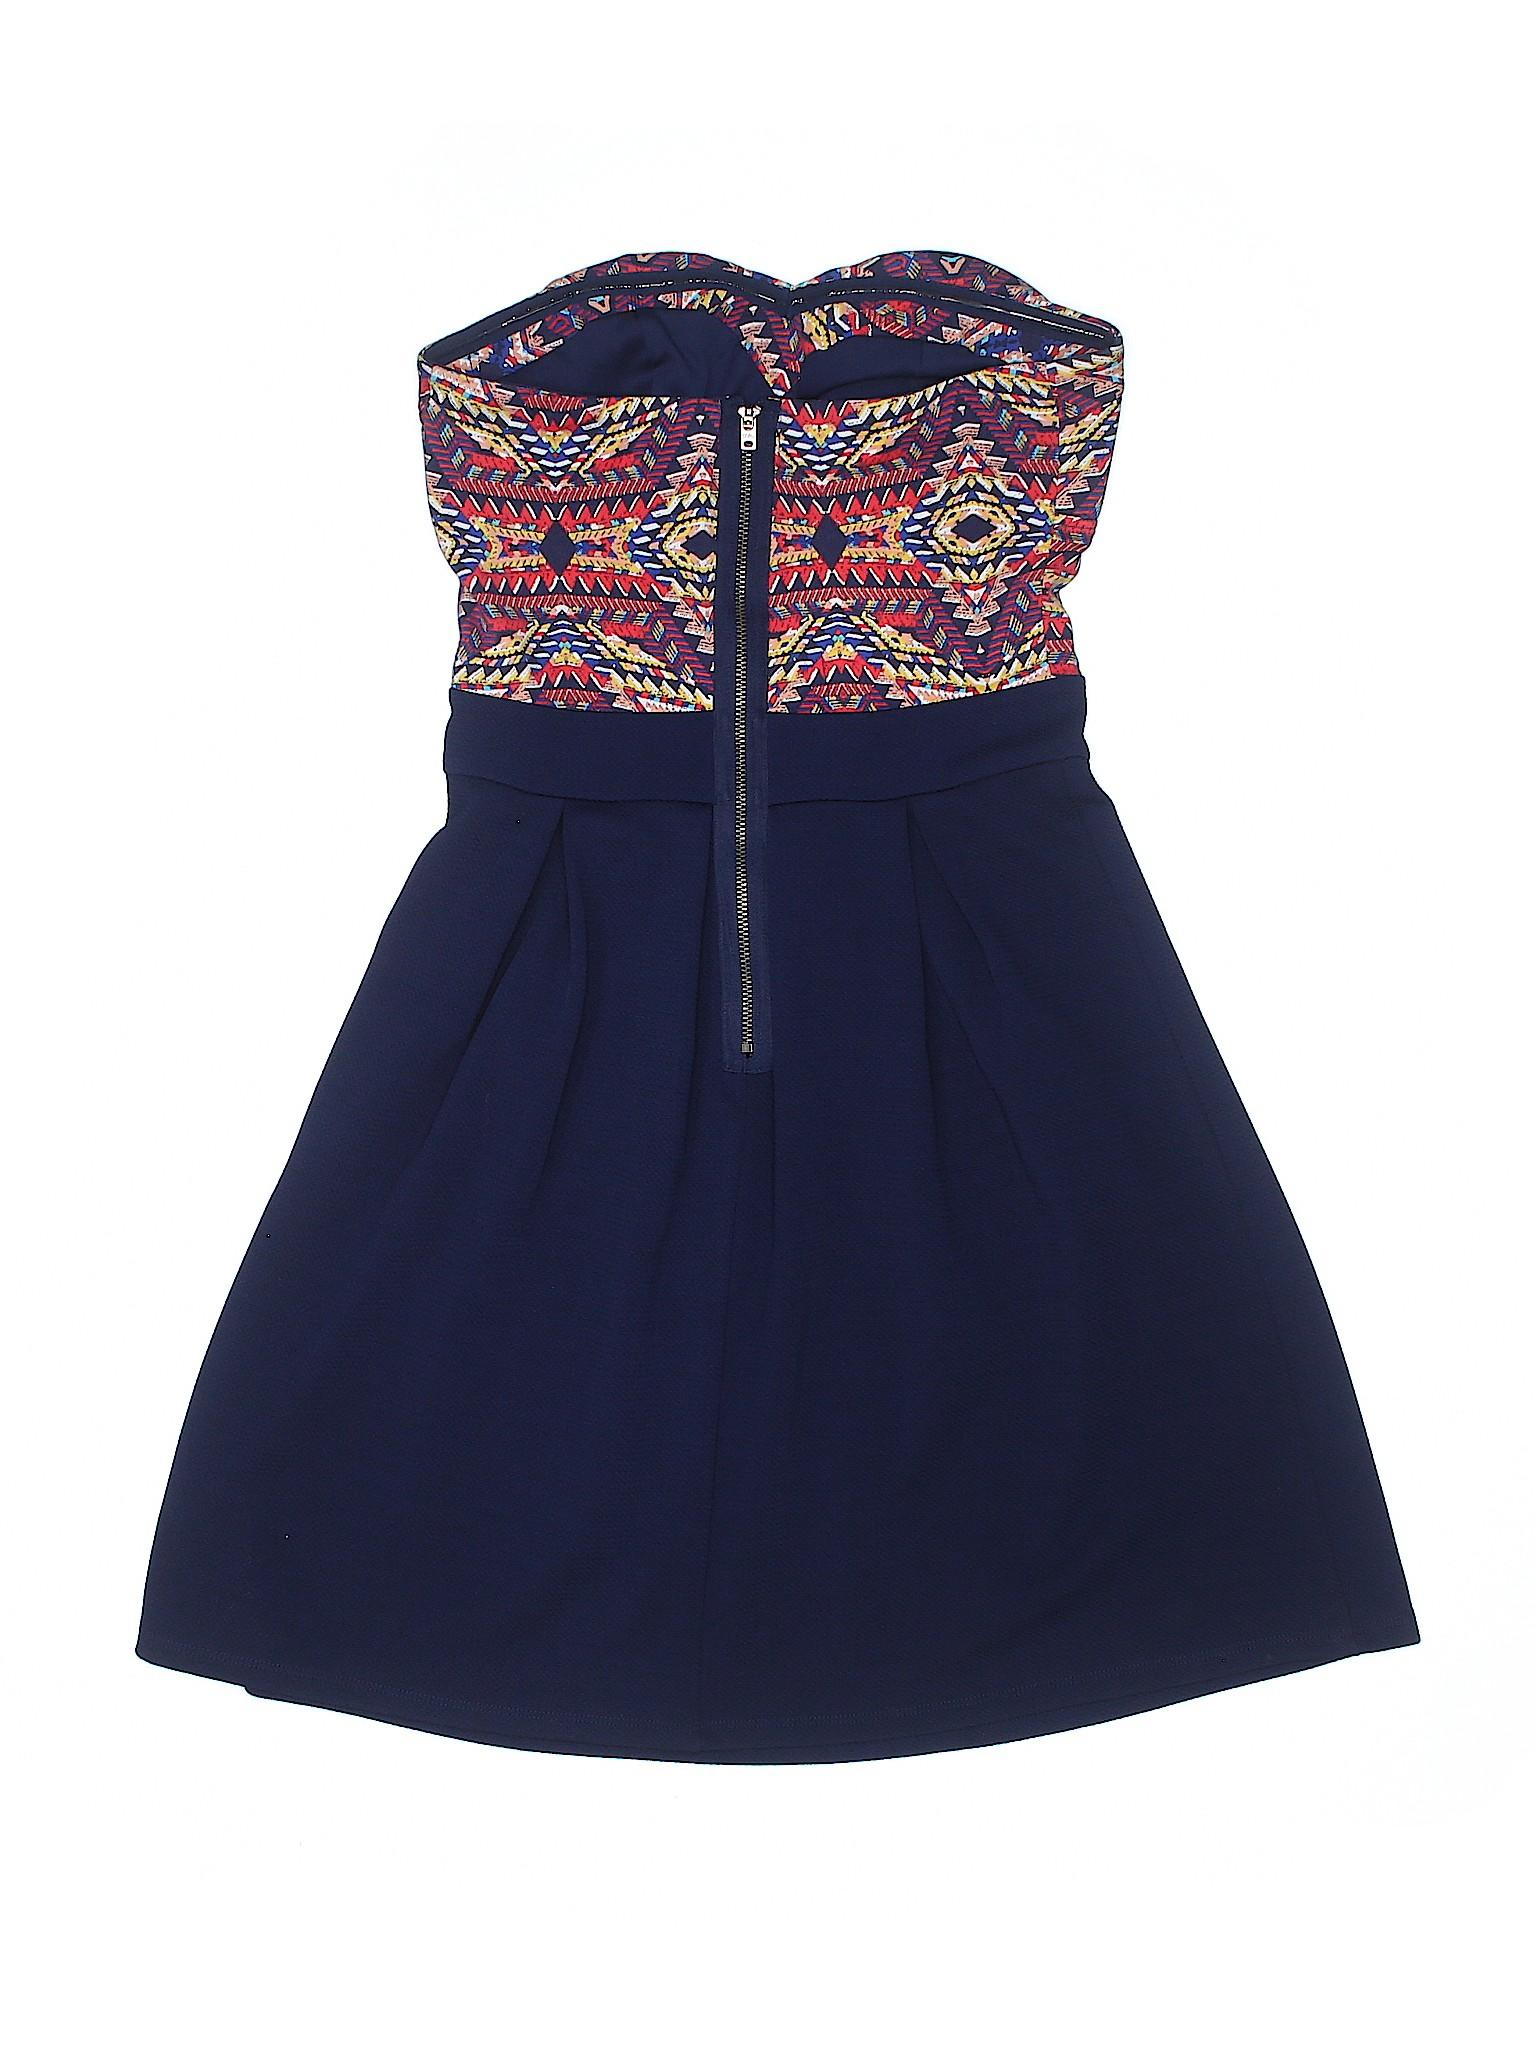 Dress Xhilaration Casual Selling Xhilaration Casual Dress Dress Xhilaration Casual Selling Selling 8SvRq7w